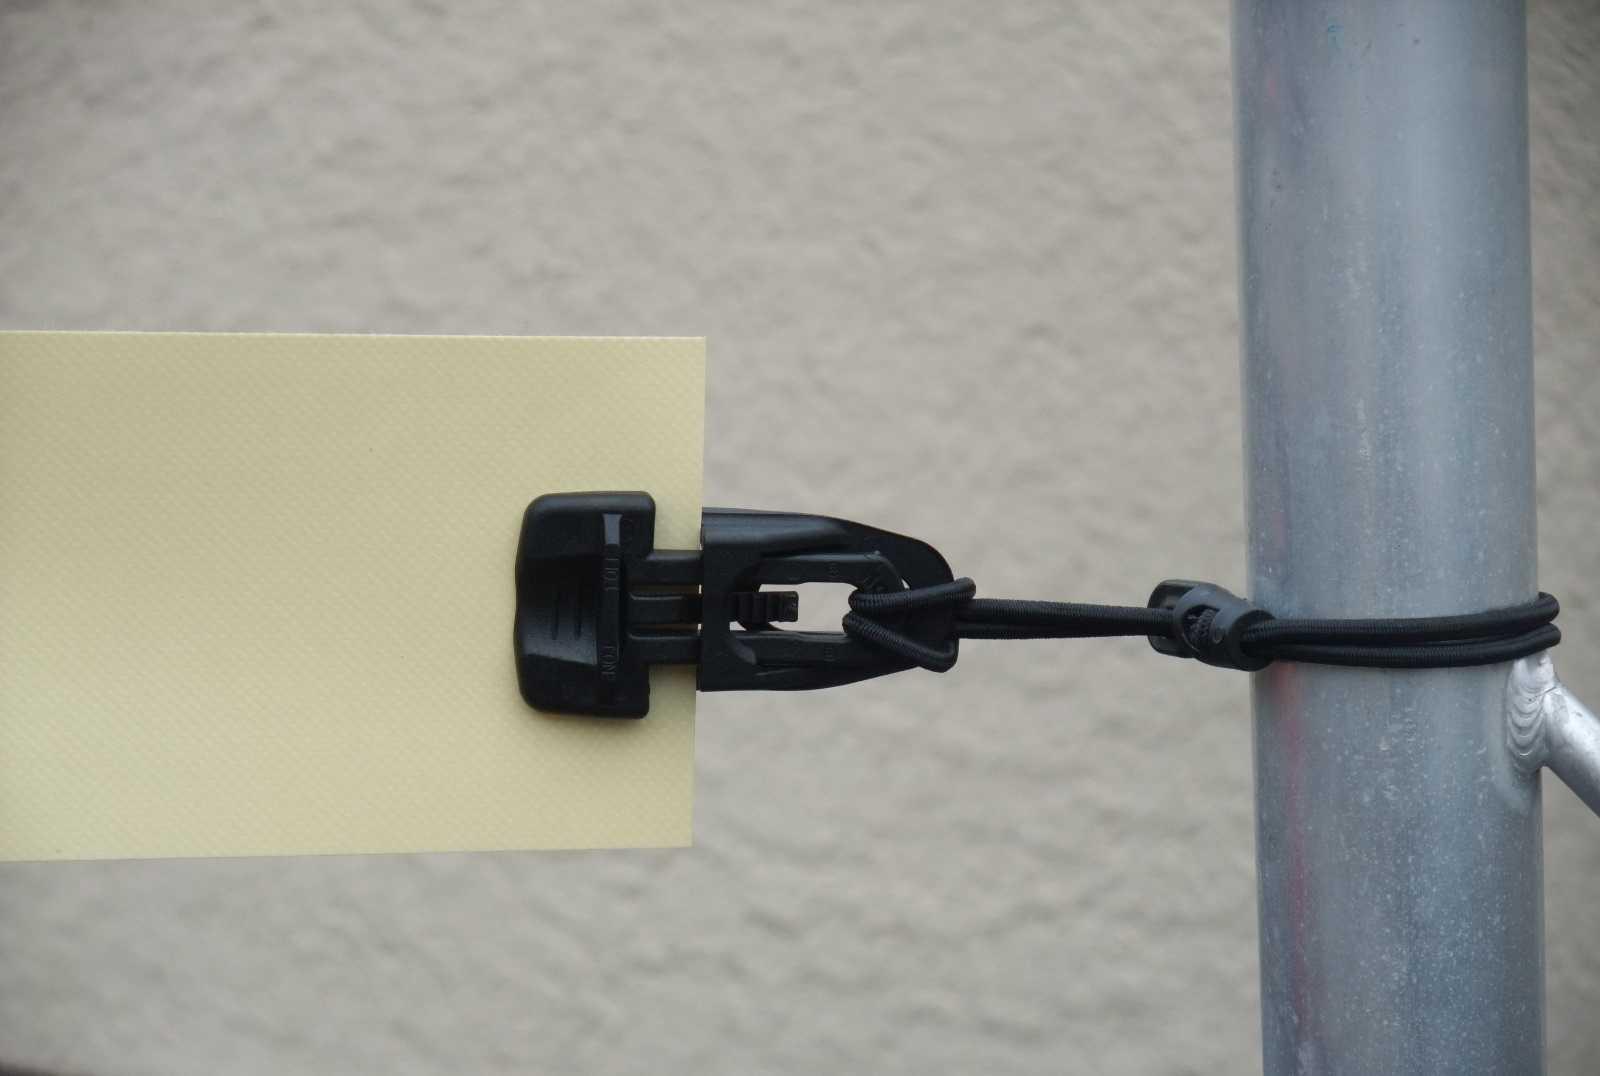 20 x Spannklammer grau MIDI-CLIP-Planen-Spanner-Halter 25 cm Ø 4mm Spanngummi